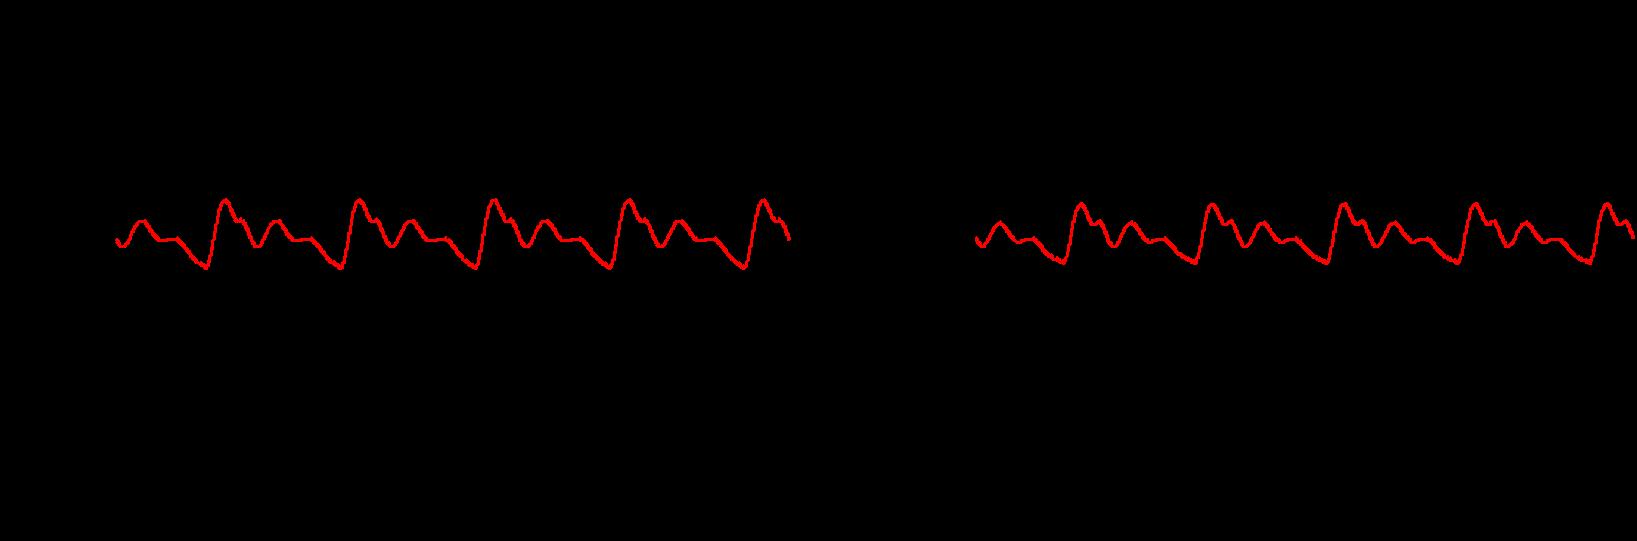 Passive Filter Design Concept of Buck Regulators for Ultra